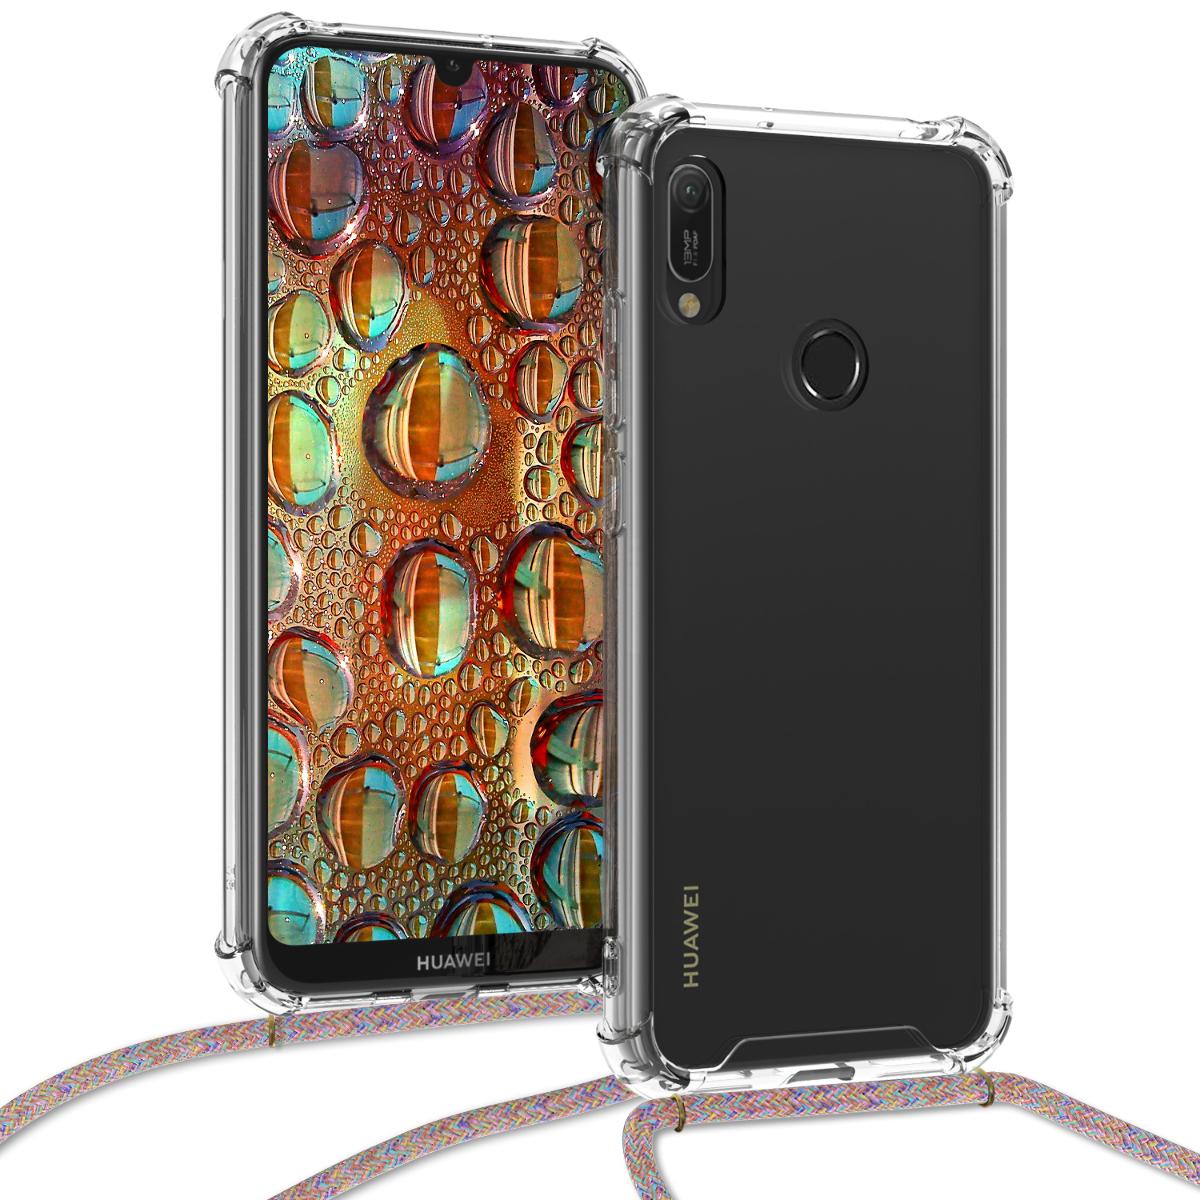 KW Θήκη Σιλικόνης με Λουράκι Λαιμού Huawei Y6 2019 - Transparent / Multicolor (48864.32)